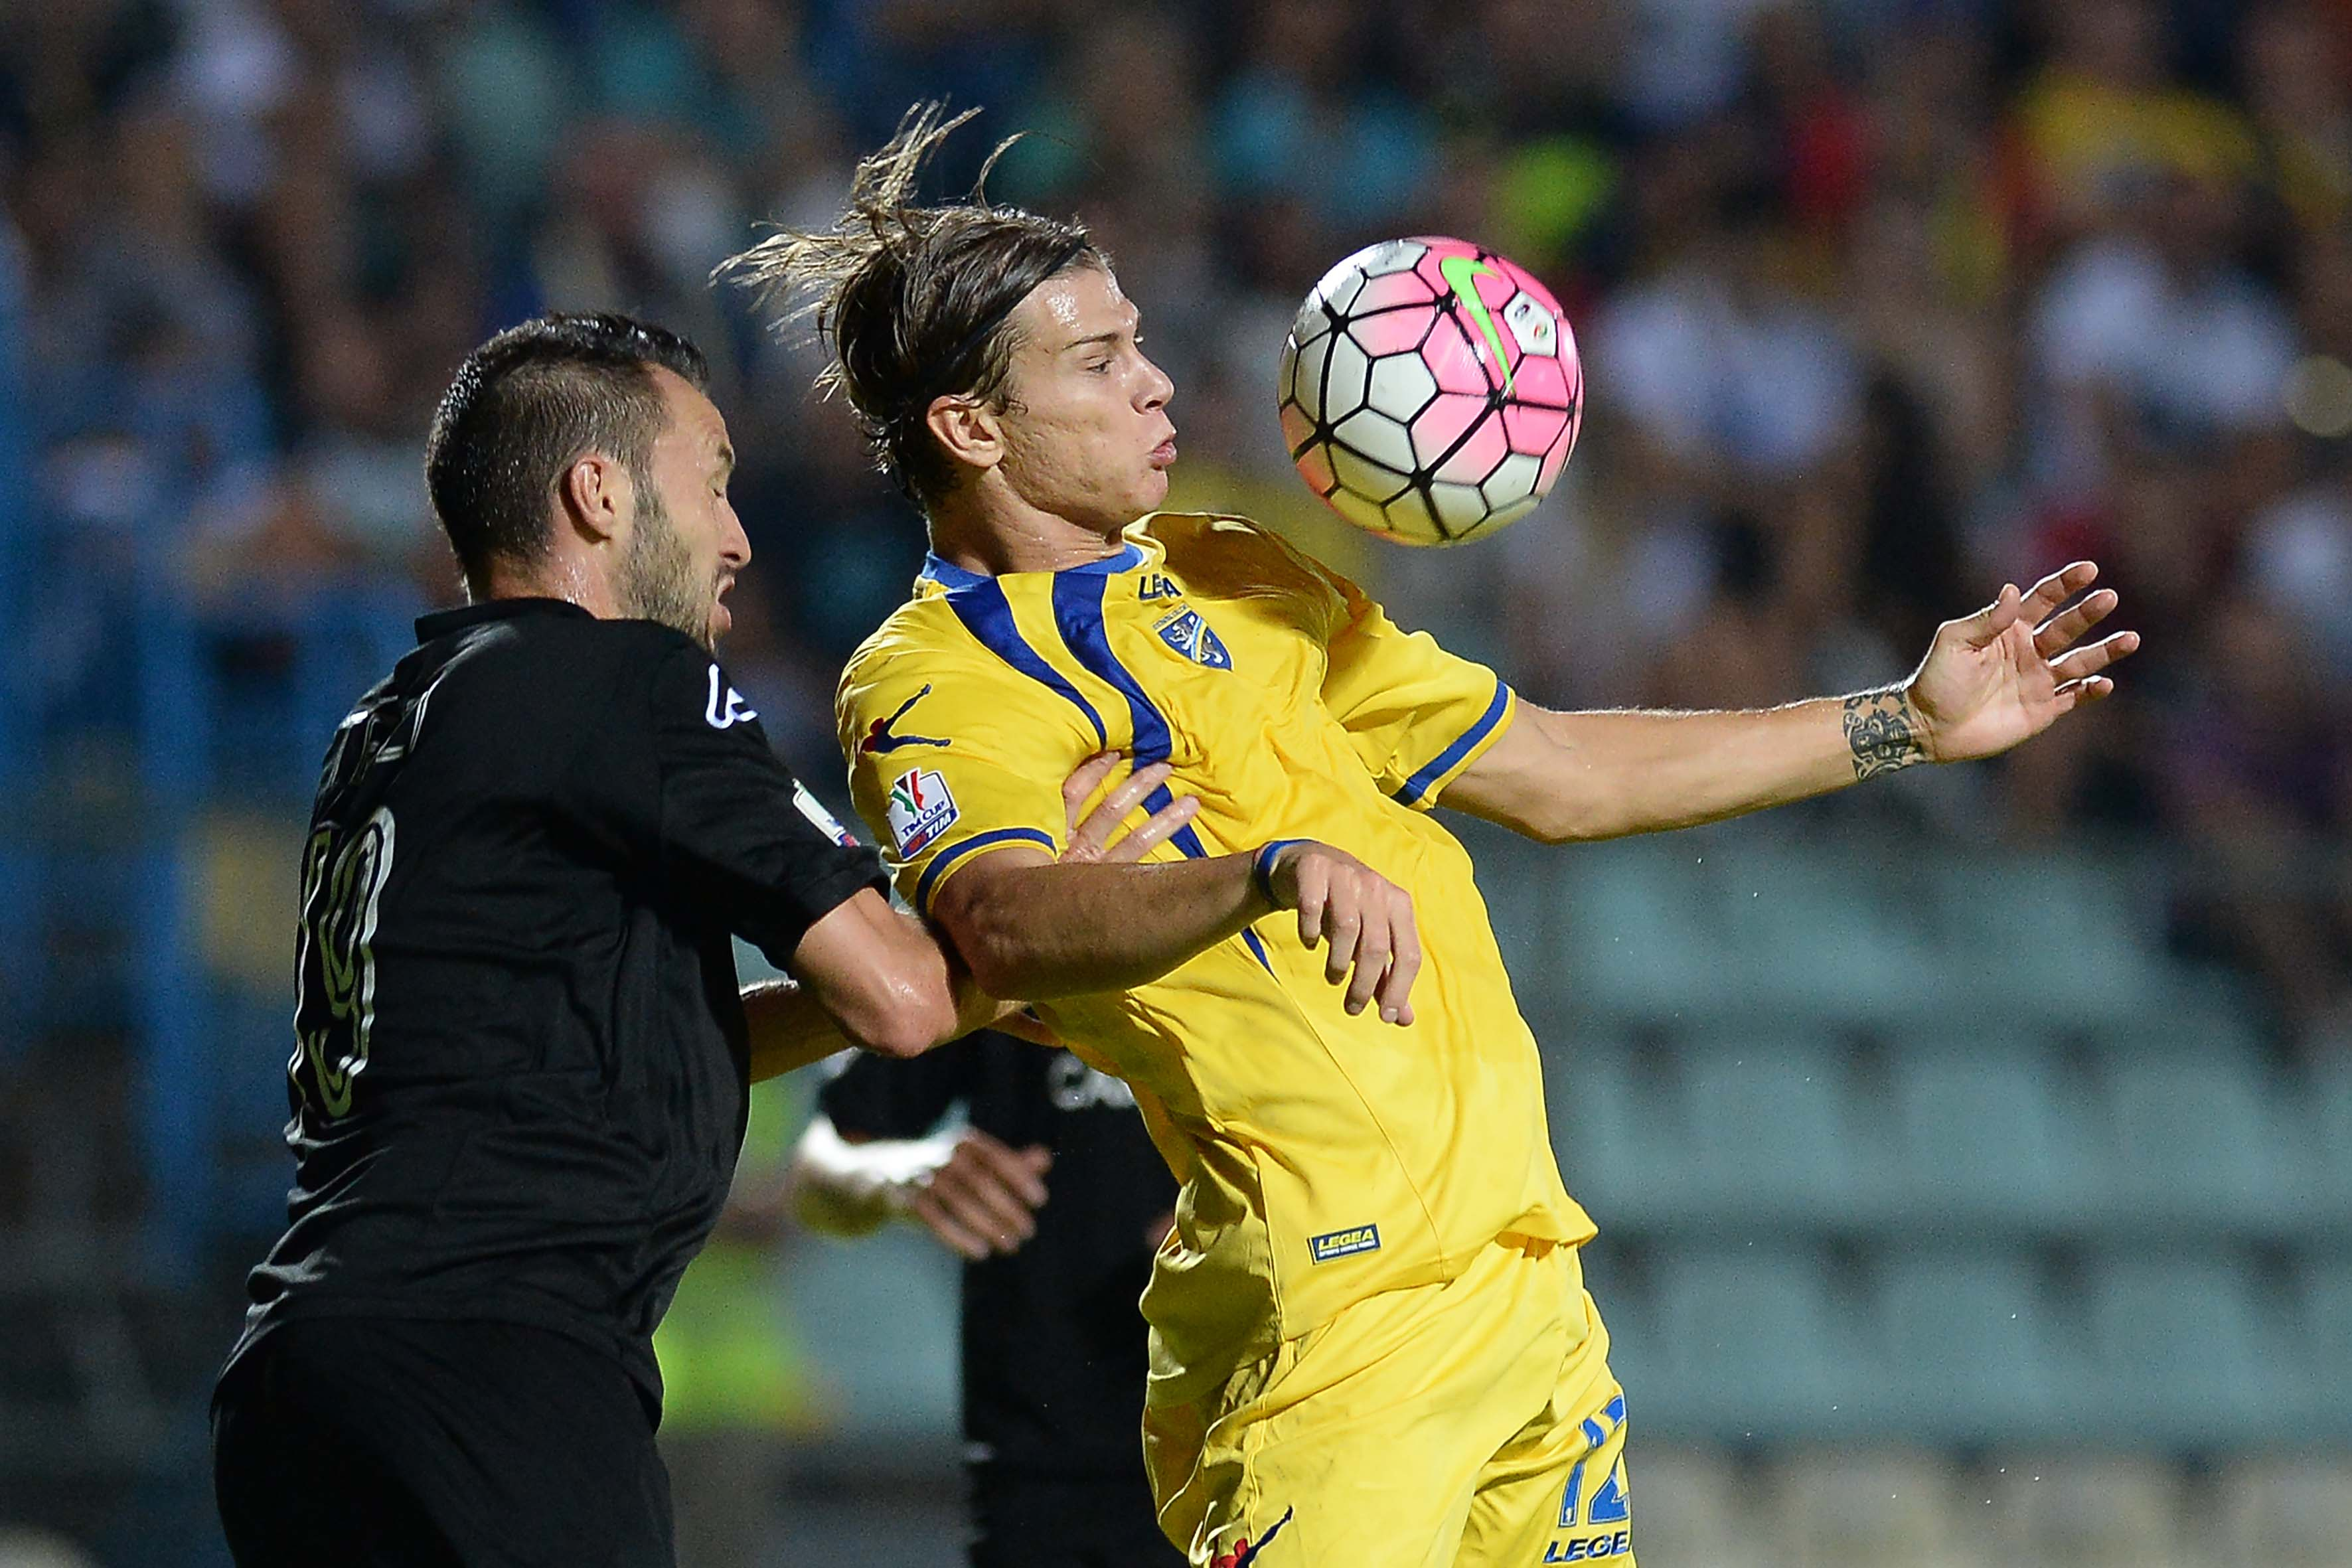 Frosinone vs Spezia